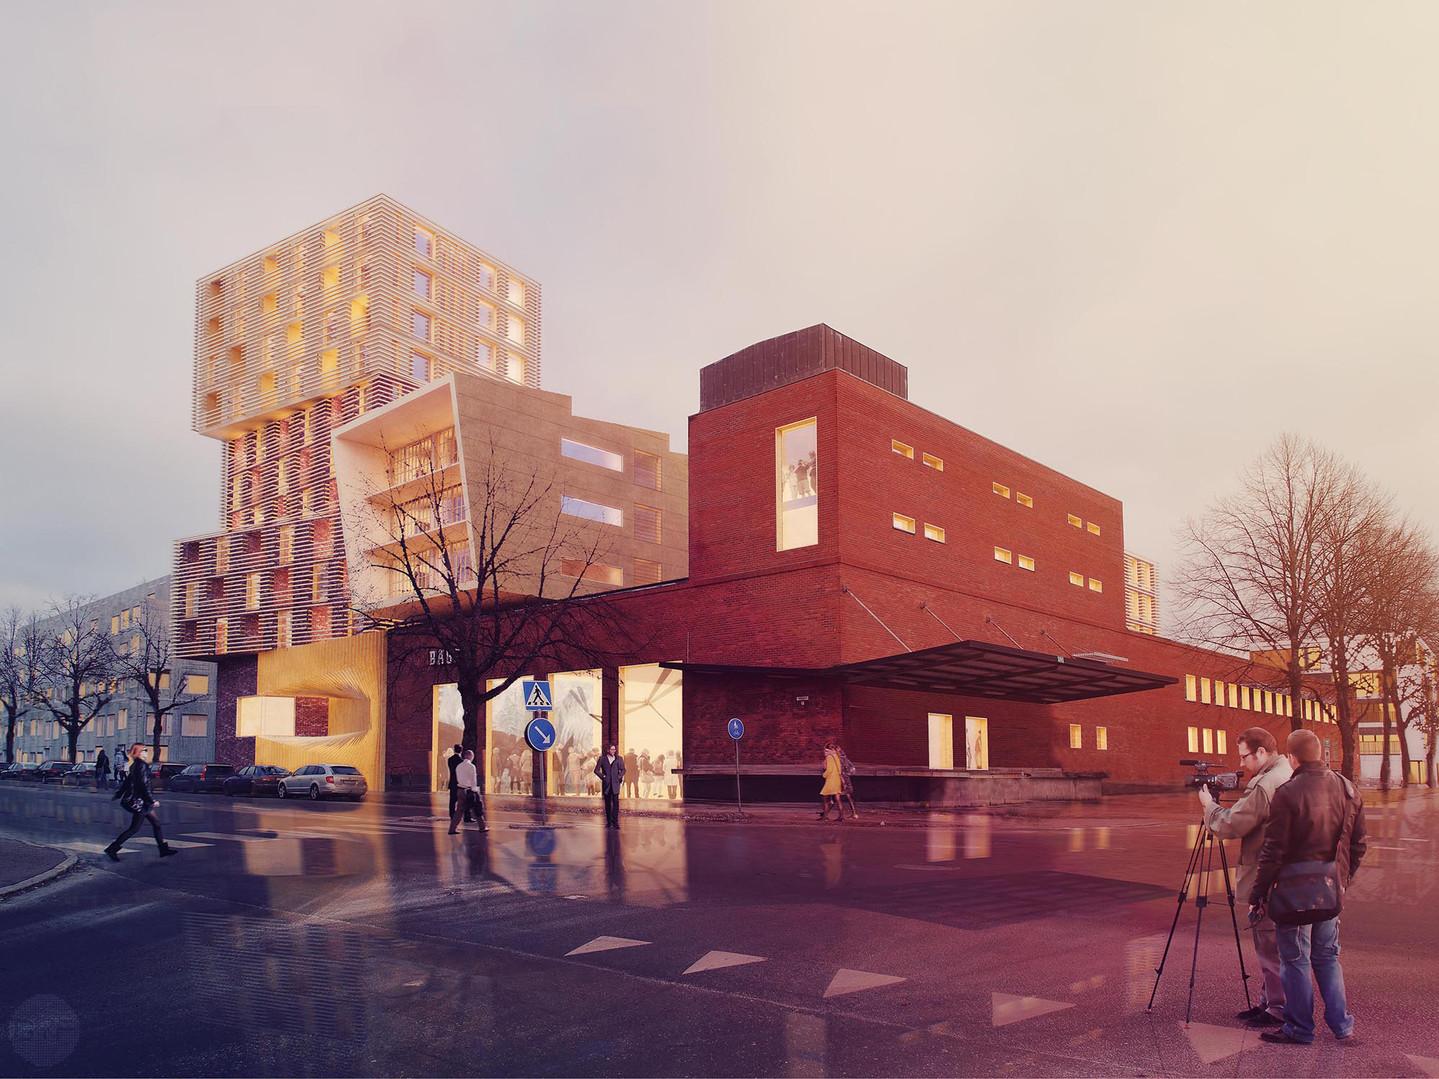 New city block in ex-industrial area Tullholmssågen